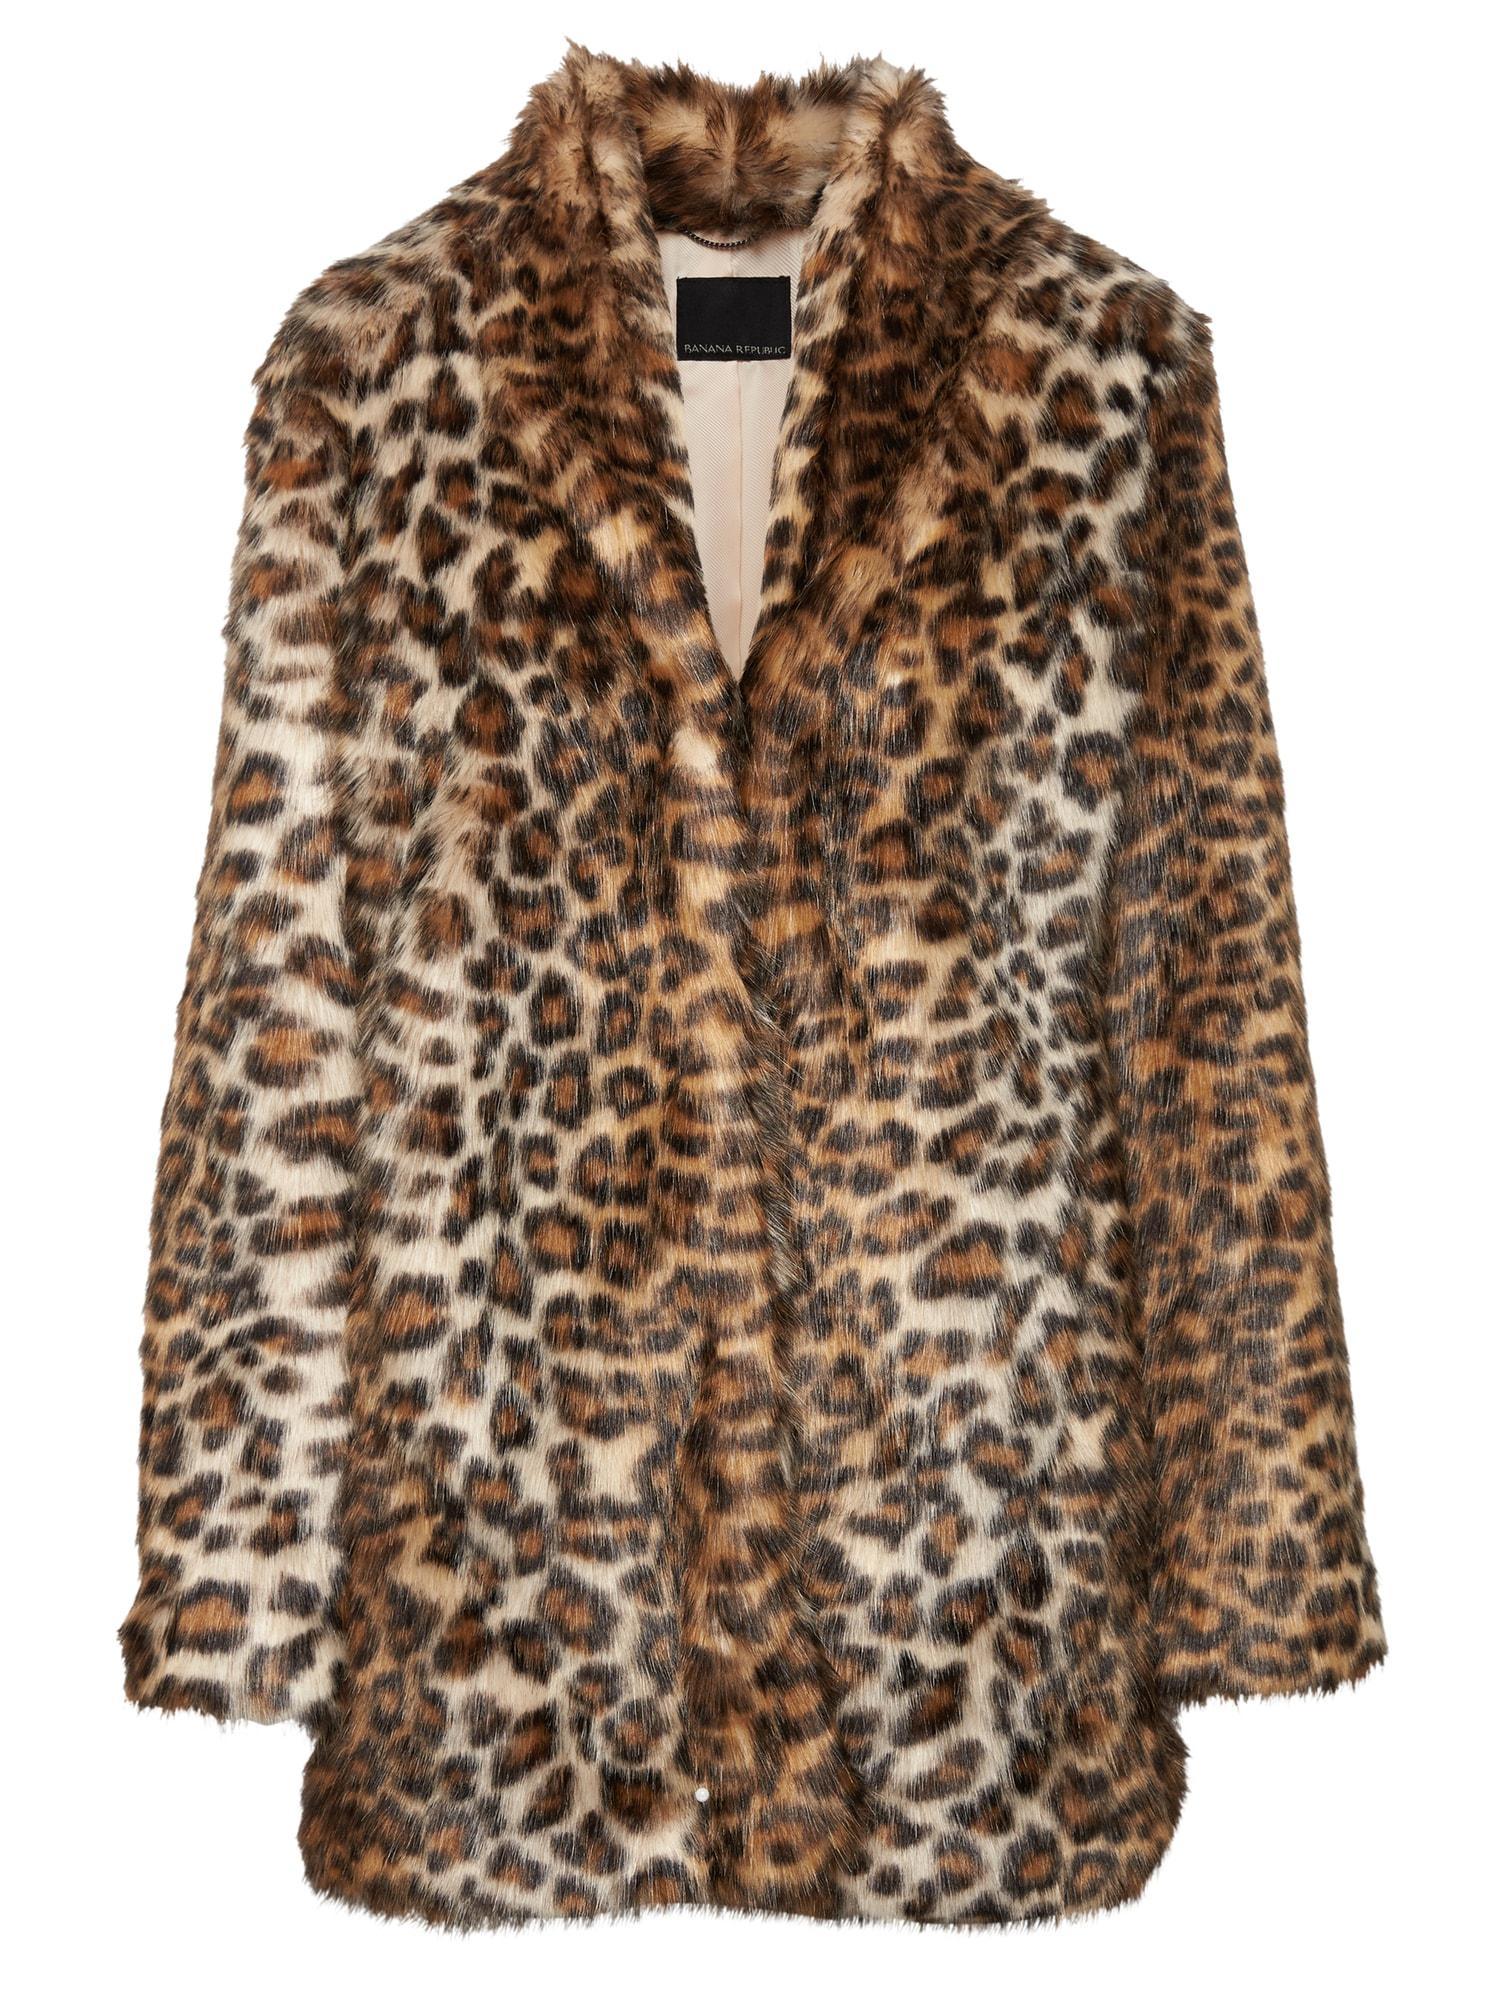 42a97c79dbd Lyst - Banana Republic Leopard Print Faux Fur Coat in Brown